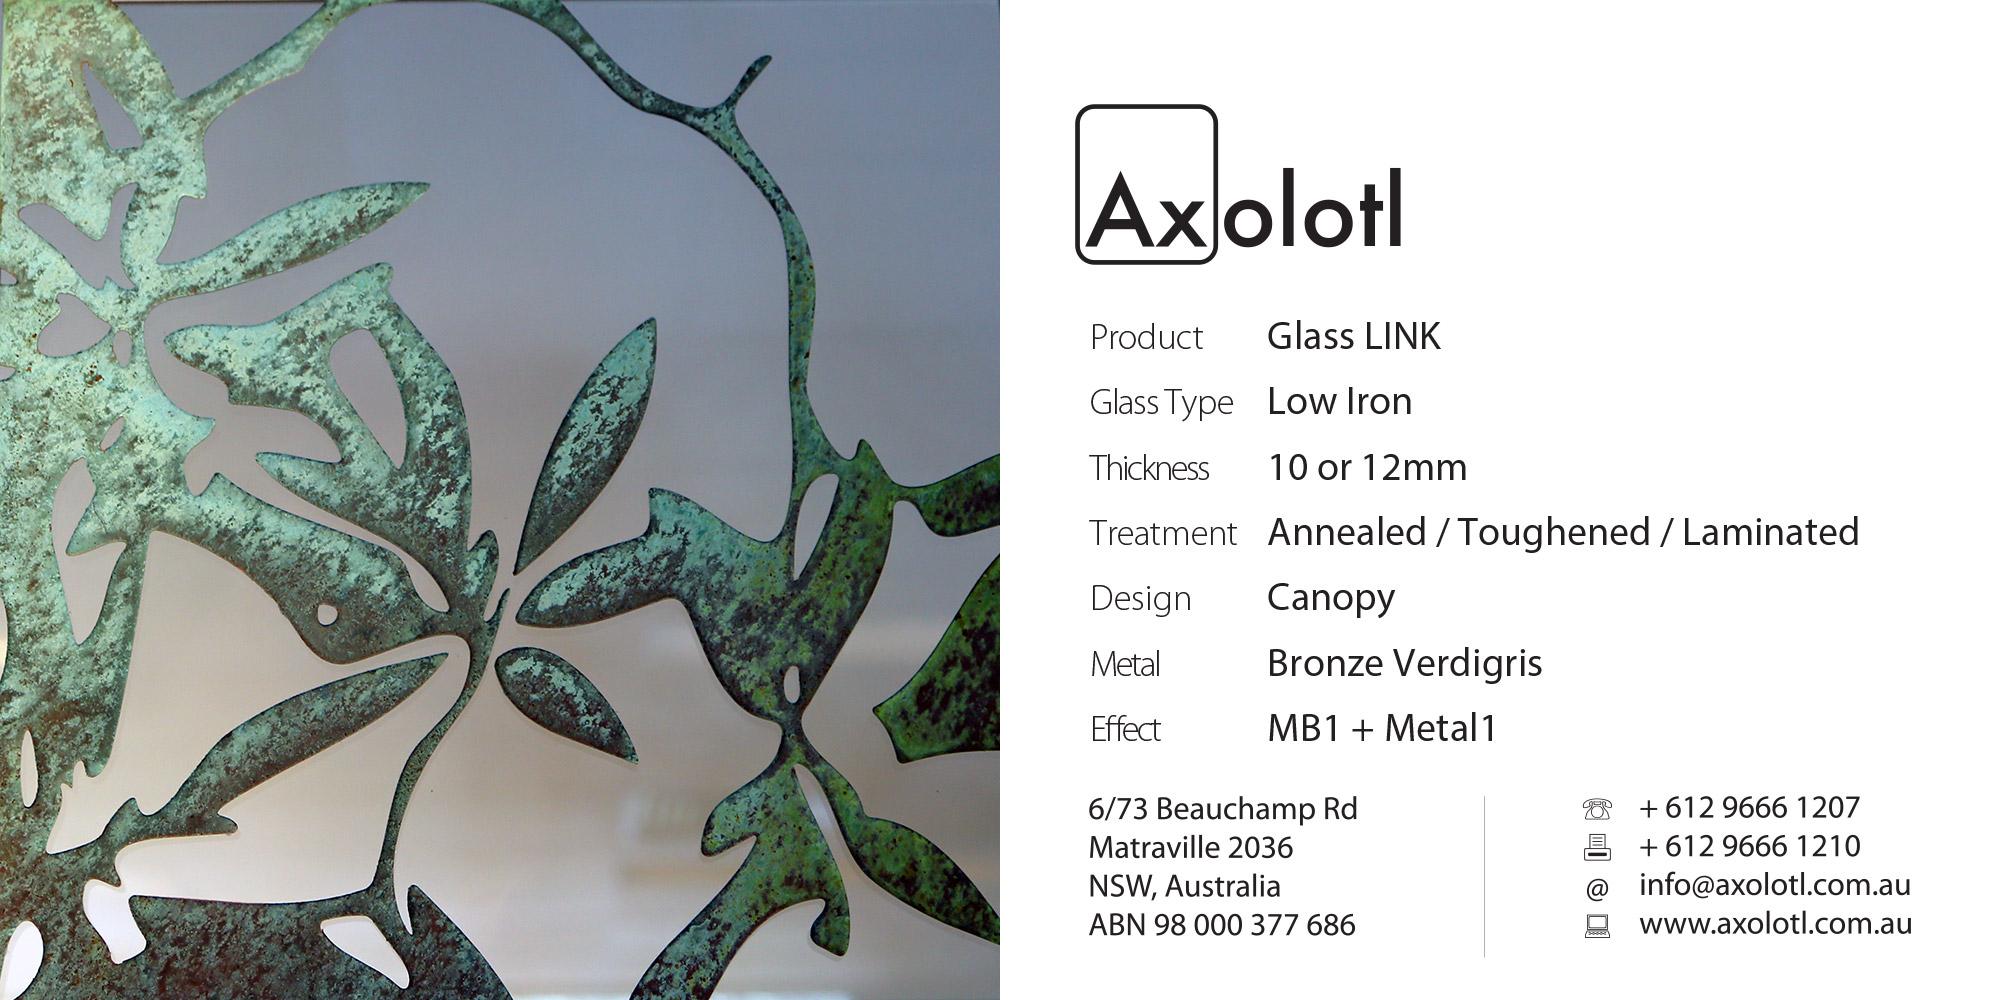 Axolotl_GlassLINK_BronzeVerdigris_Canopy.jpg